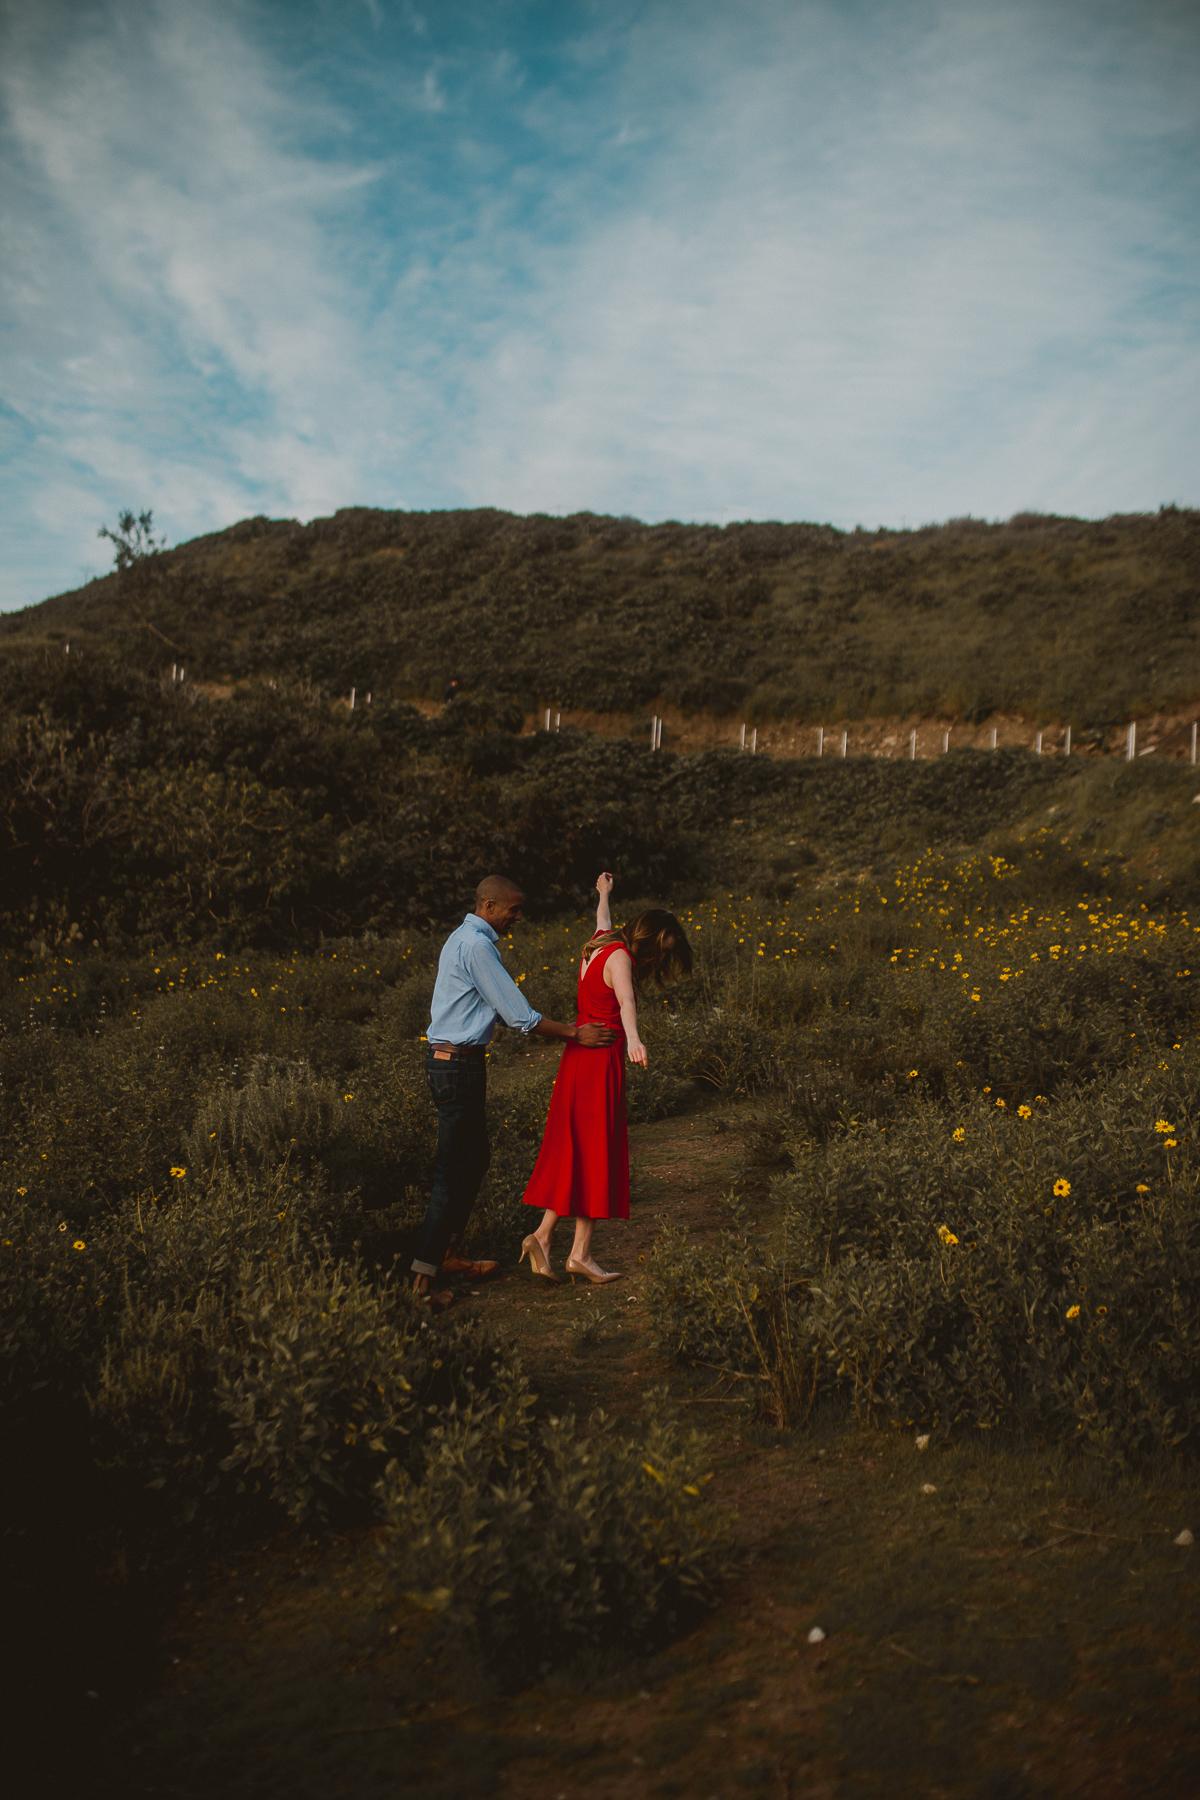 mar-vista-baldwin-hills-scenic-overlook-engagement-kelley-raye-los-angeles-wedding-photographer-175.jpg